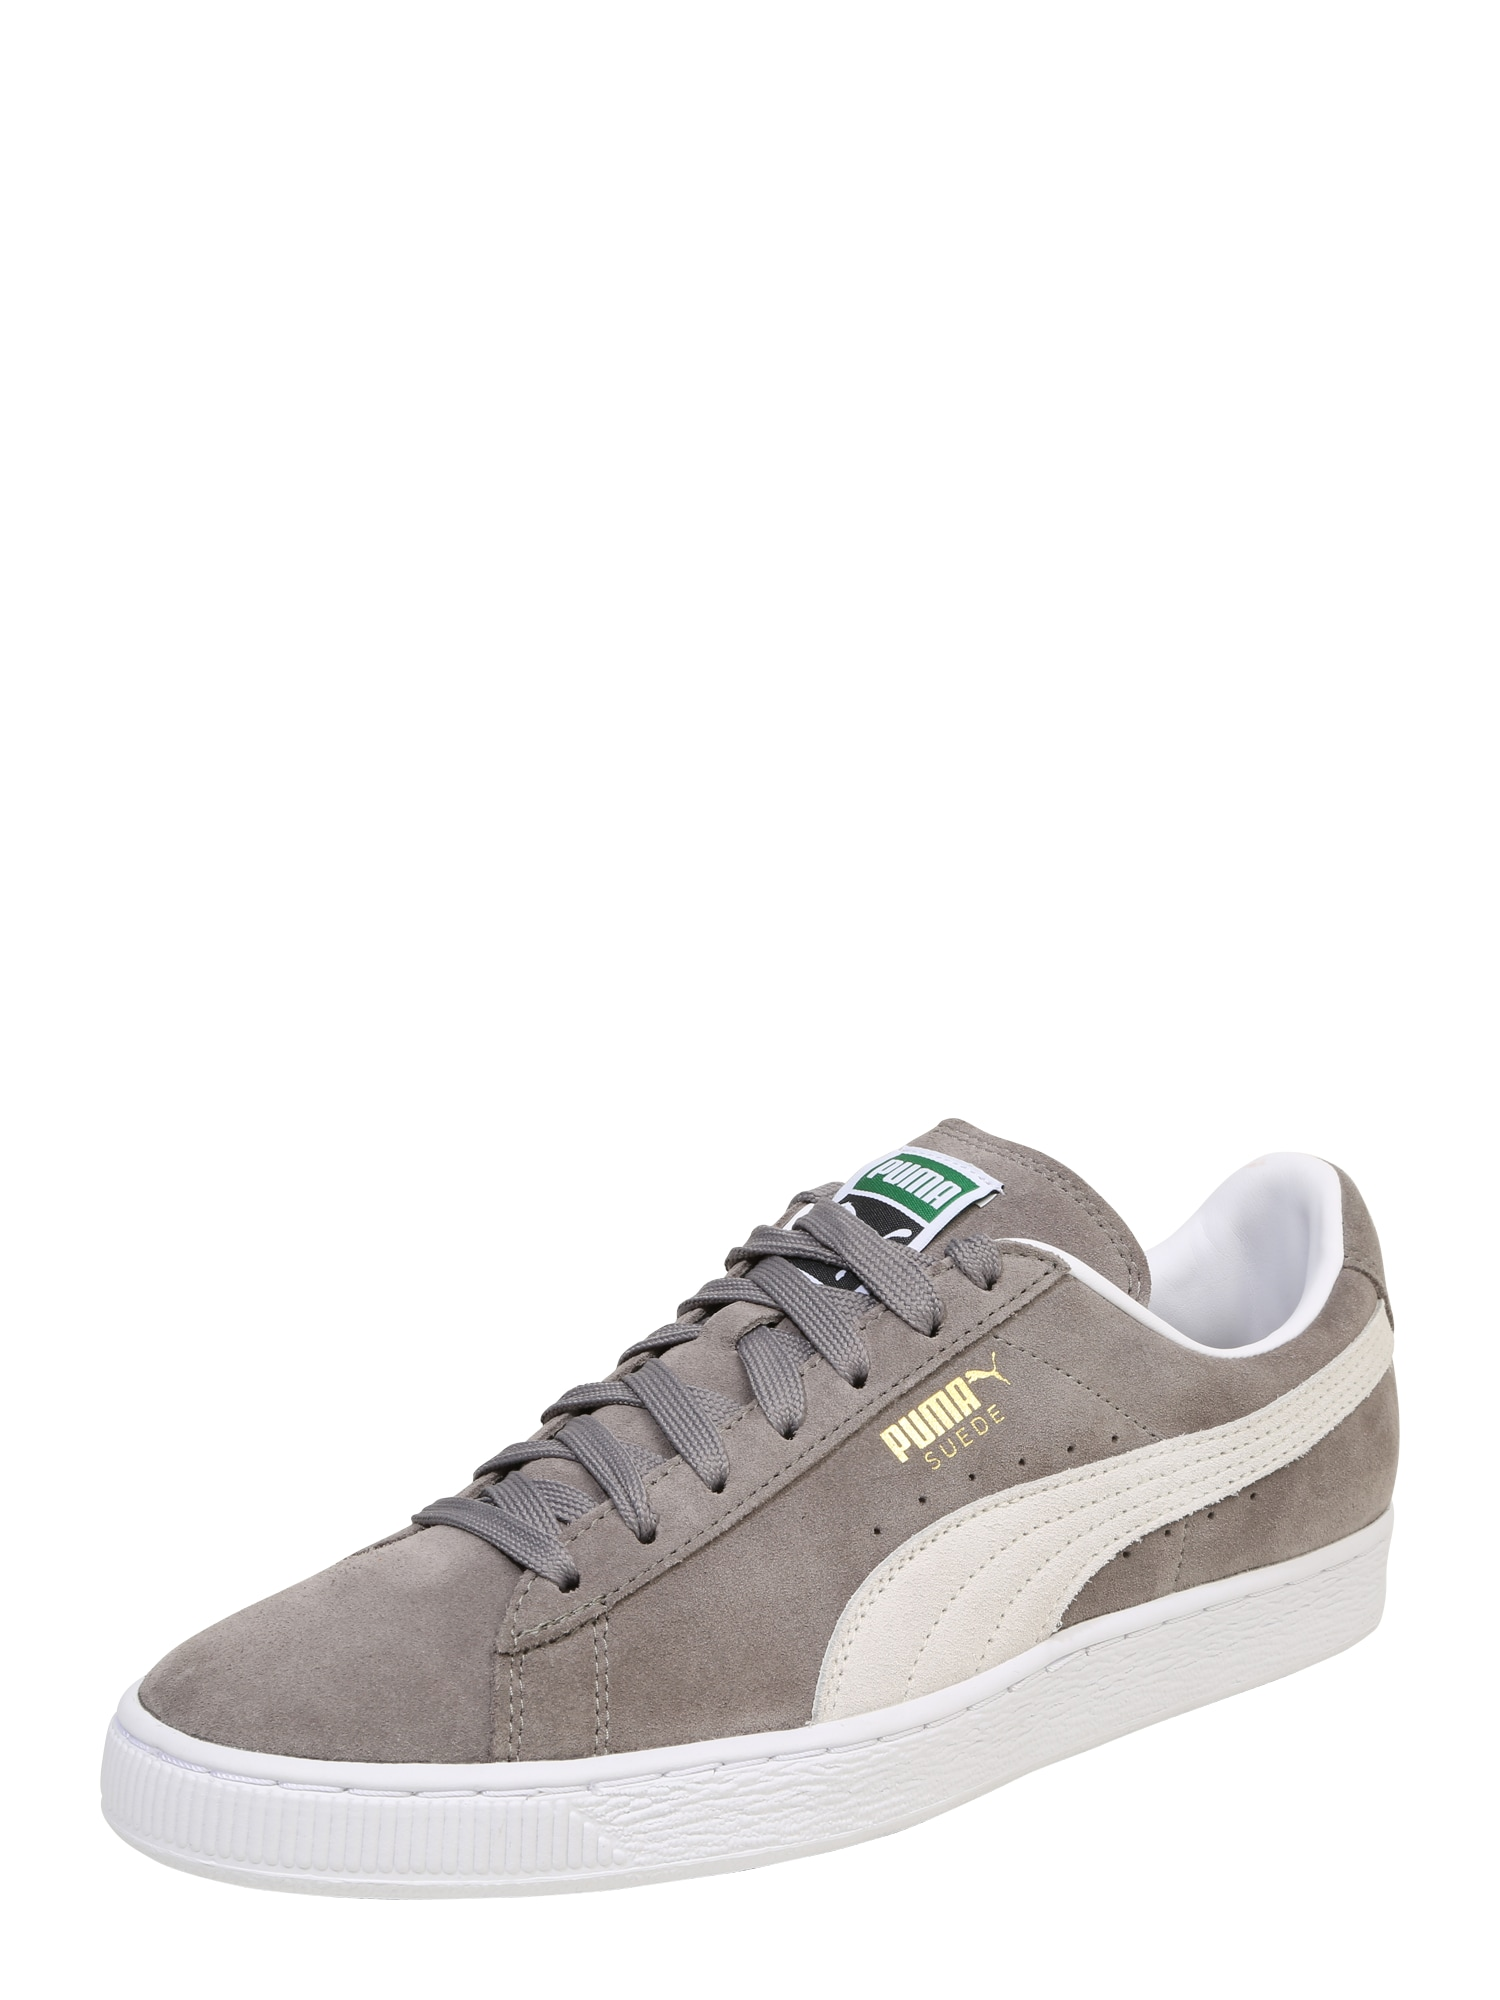 PUMA, Heren Sneakers laag 'Suede Classic', greige / wit